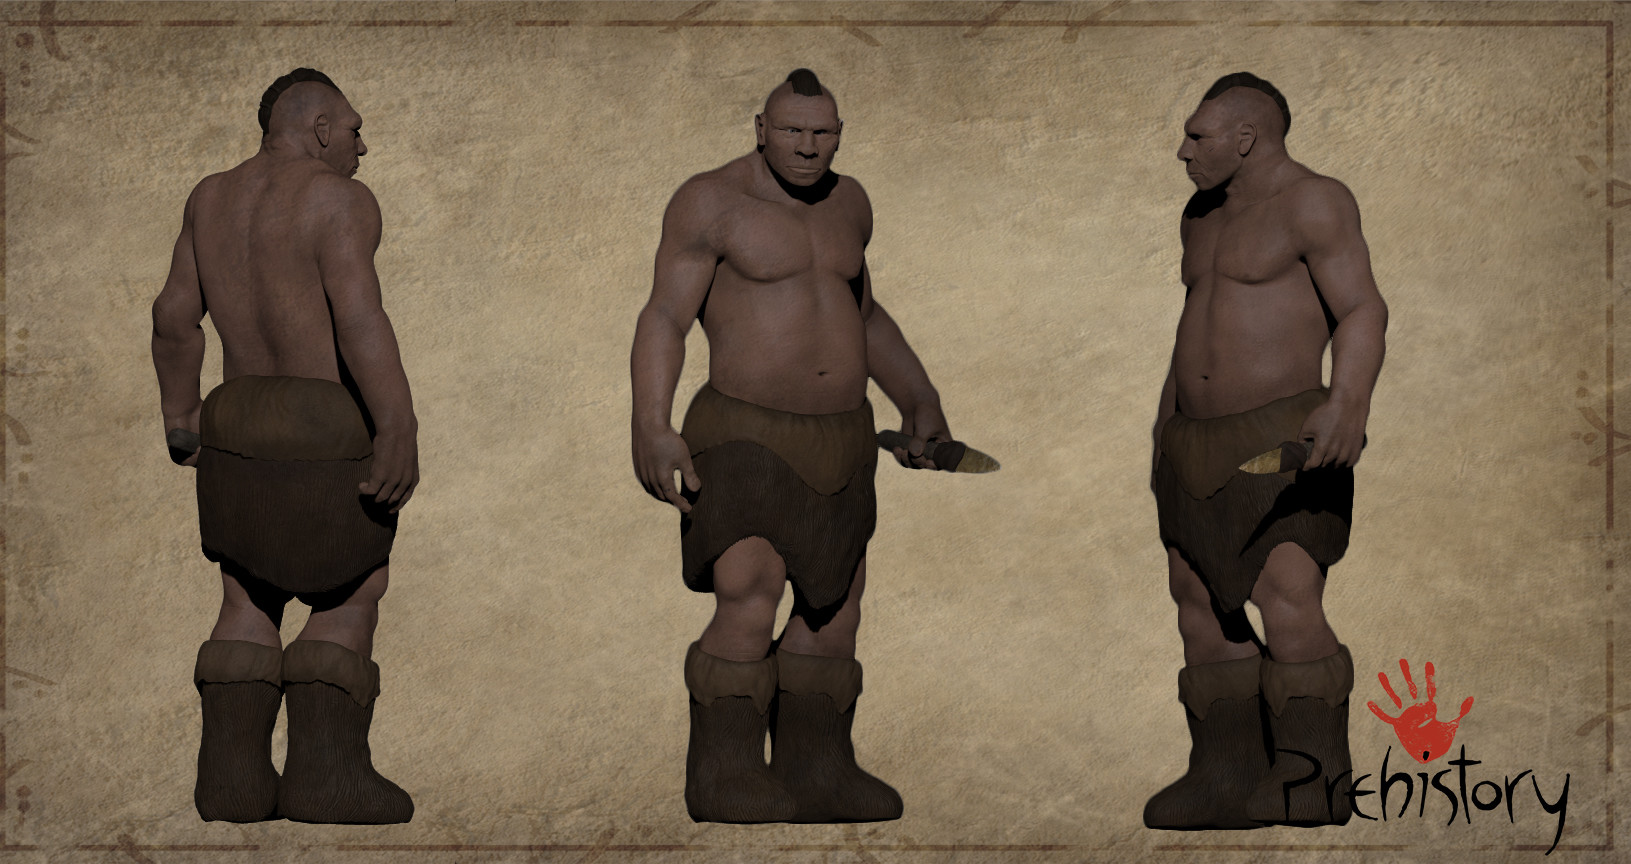 Rayco gonzalez neandertal 3dprint versionconcept